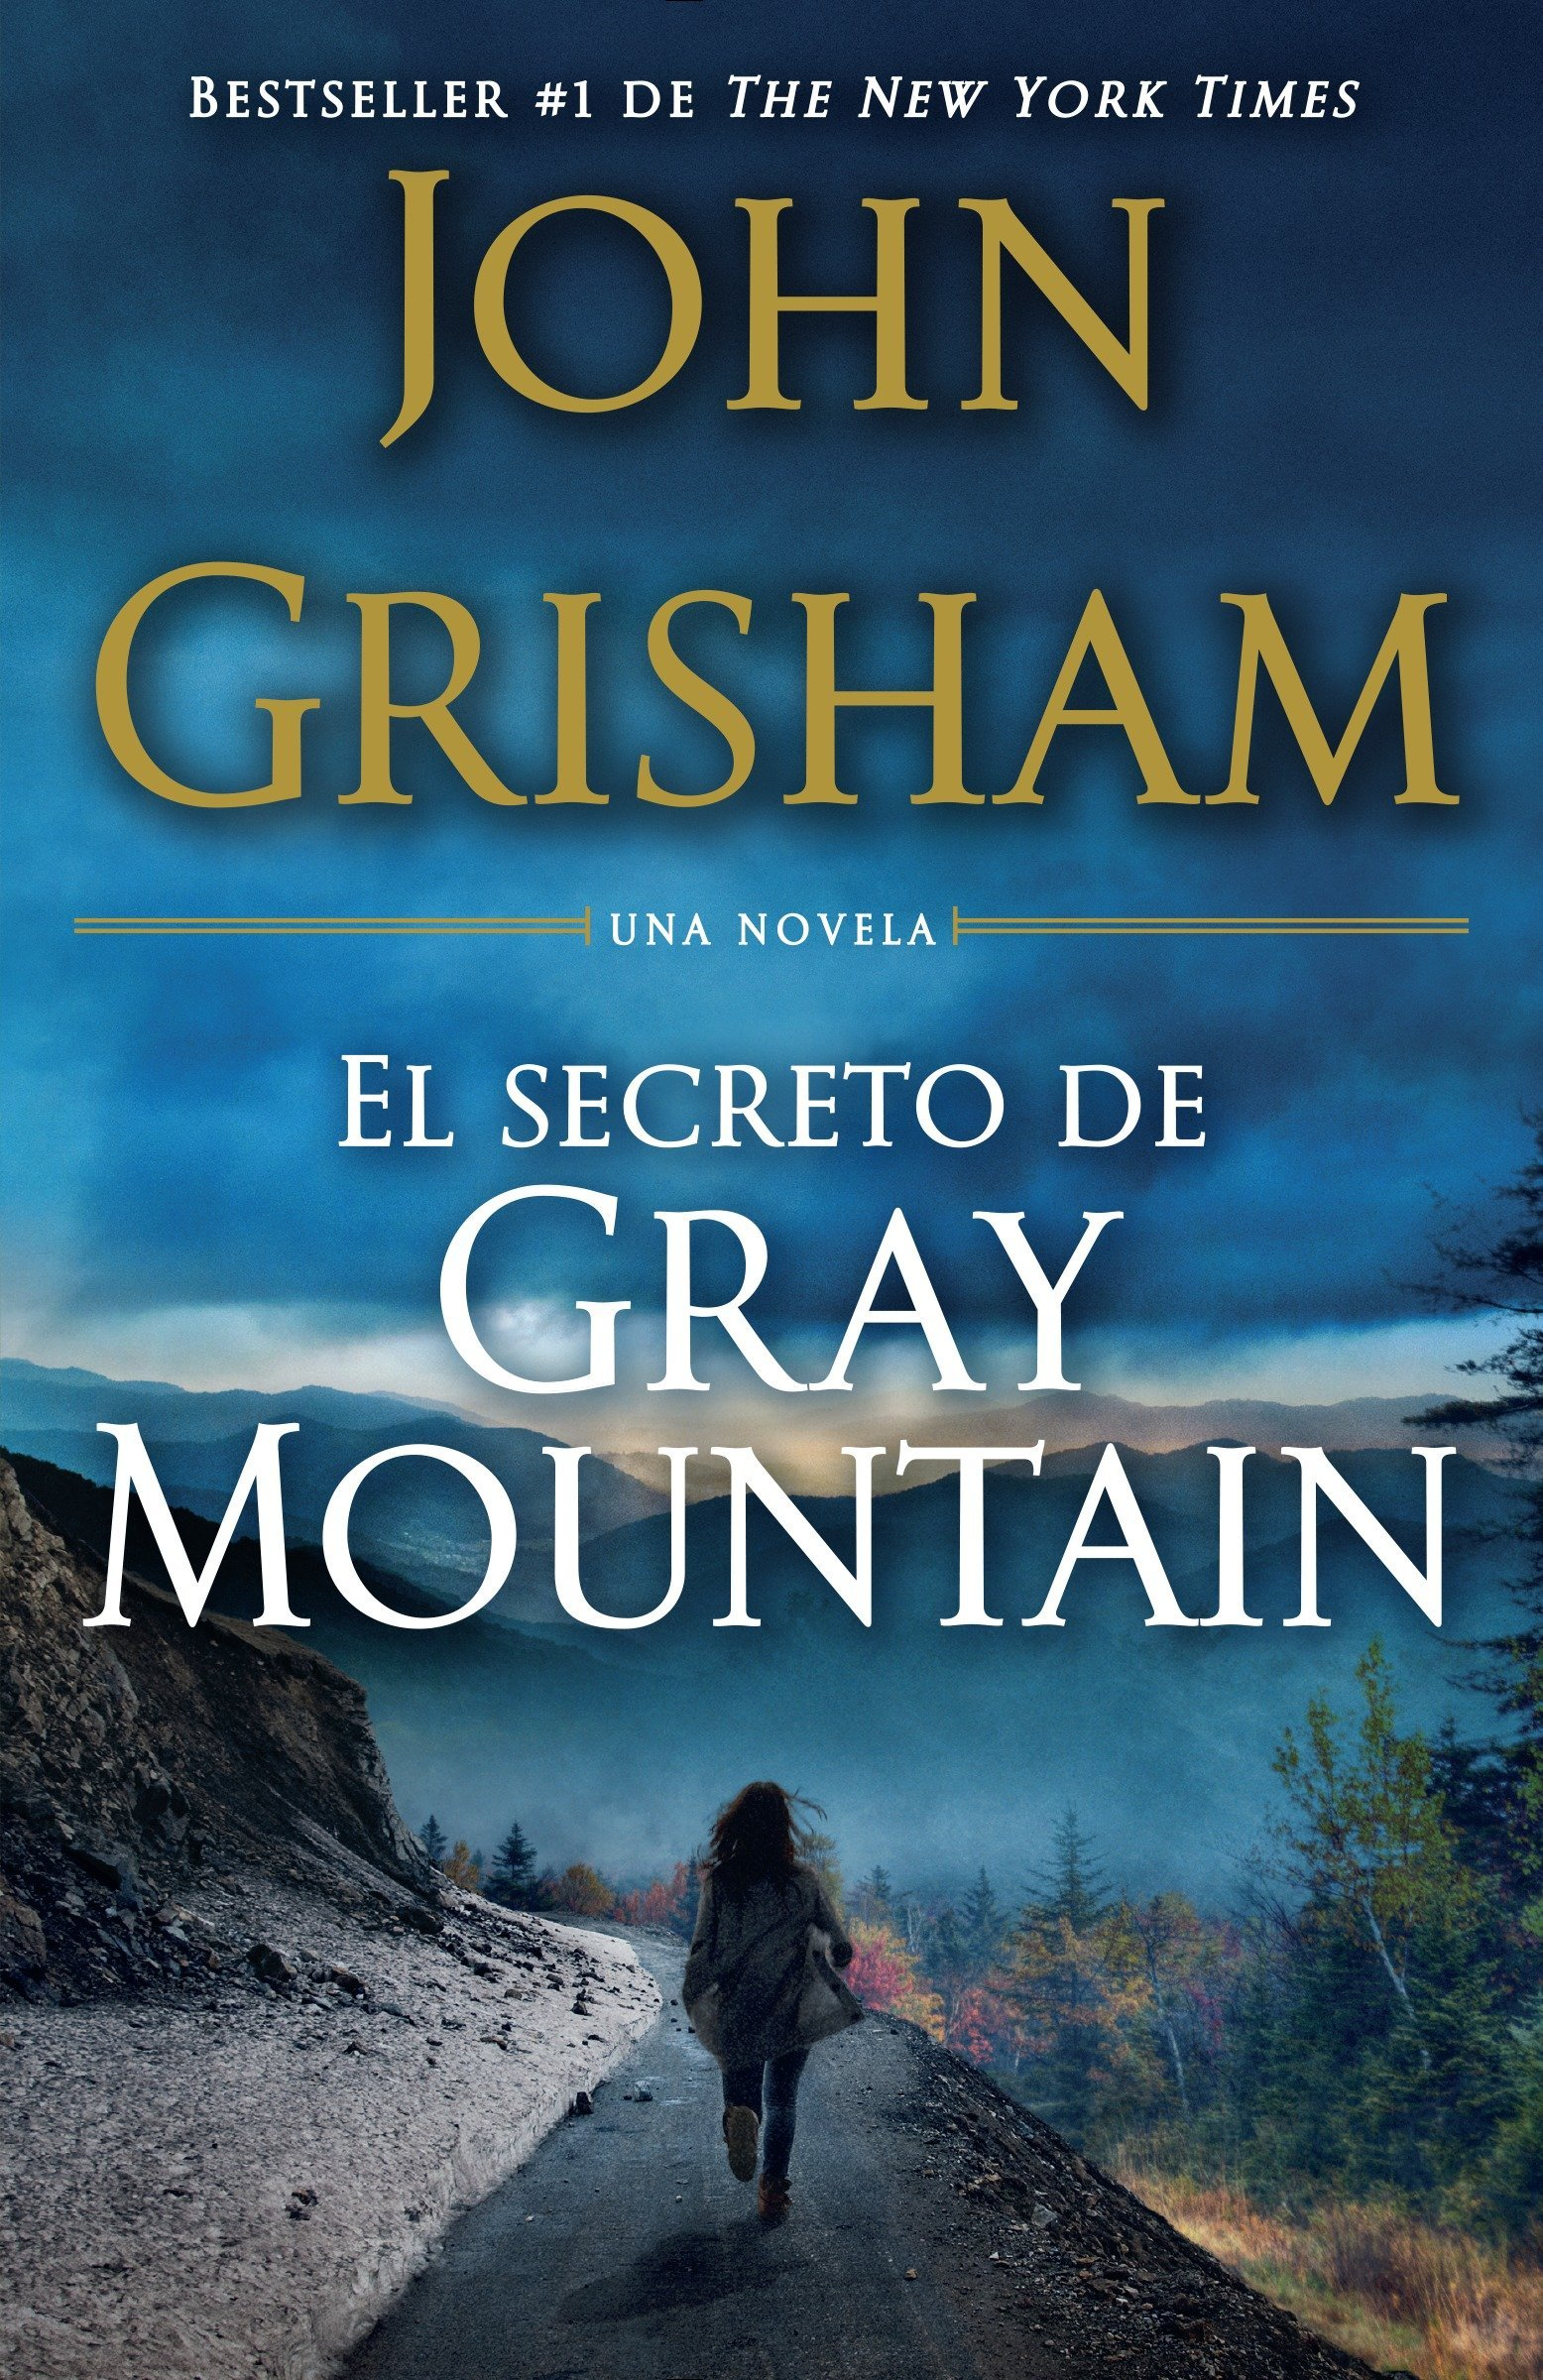 El Secreto de Gray Mountain: (Spanish-language edition) (Spanish Edition) by Vintage Espanol